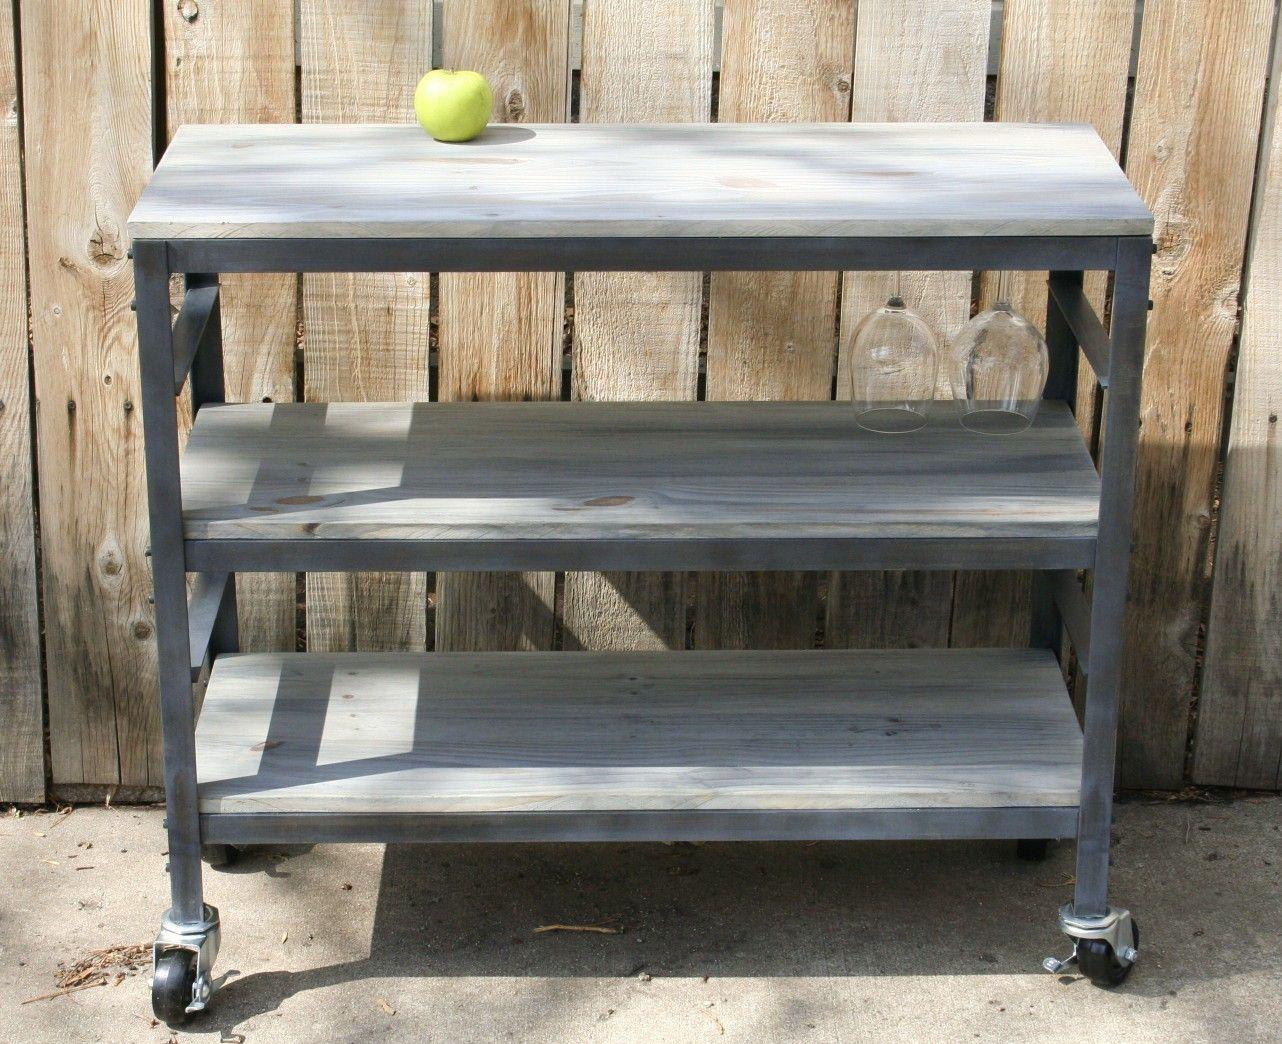 Industrial Cart As Sideboard/bar Cart Handmade Scrap Metal And Wood Table |  Etsy $475.00